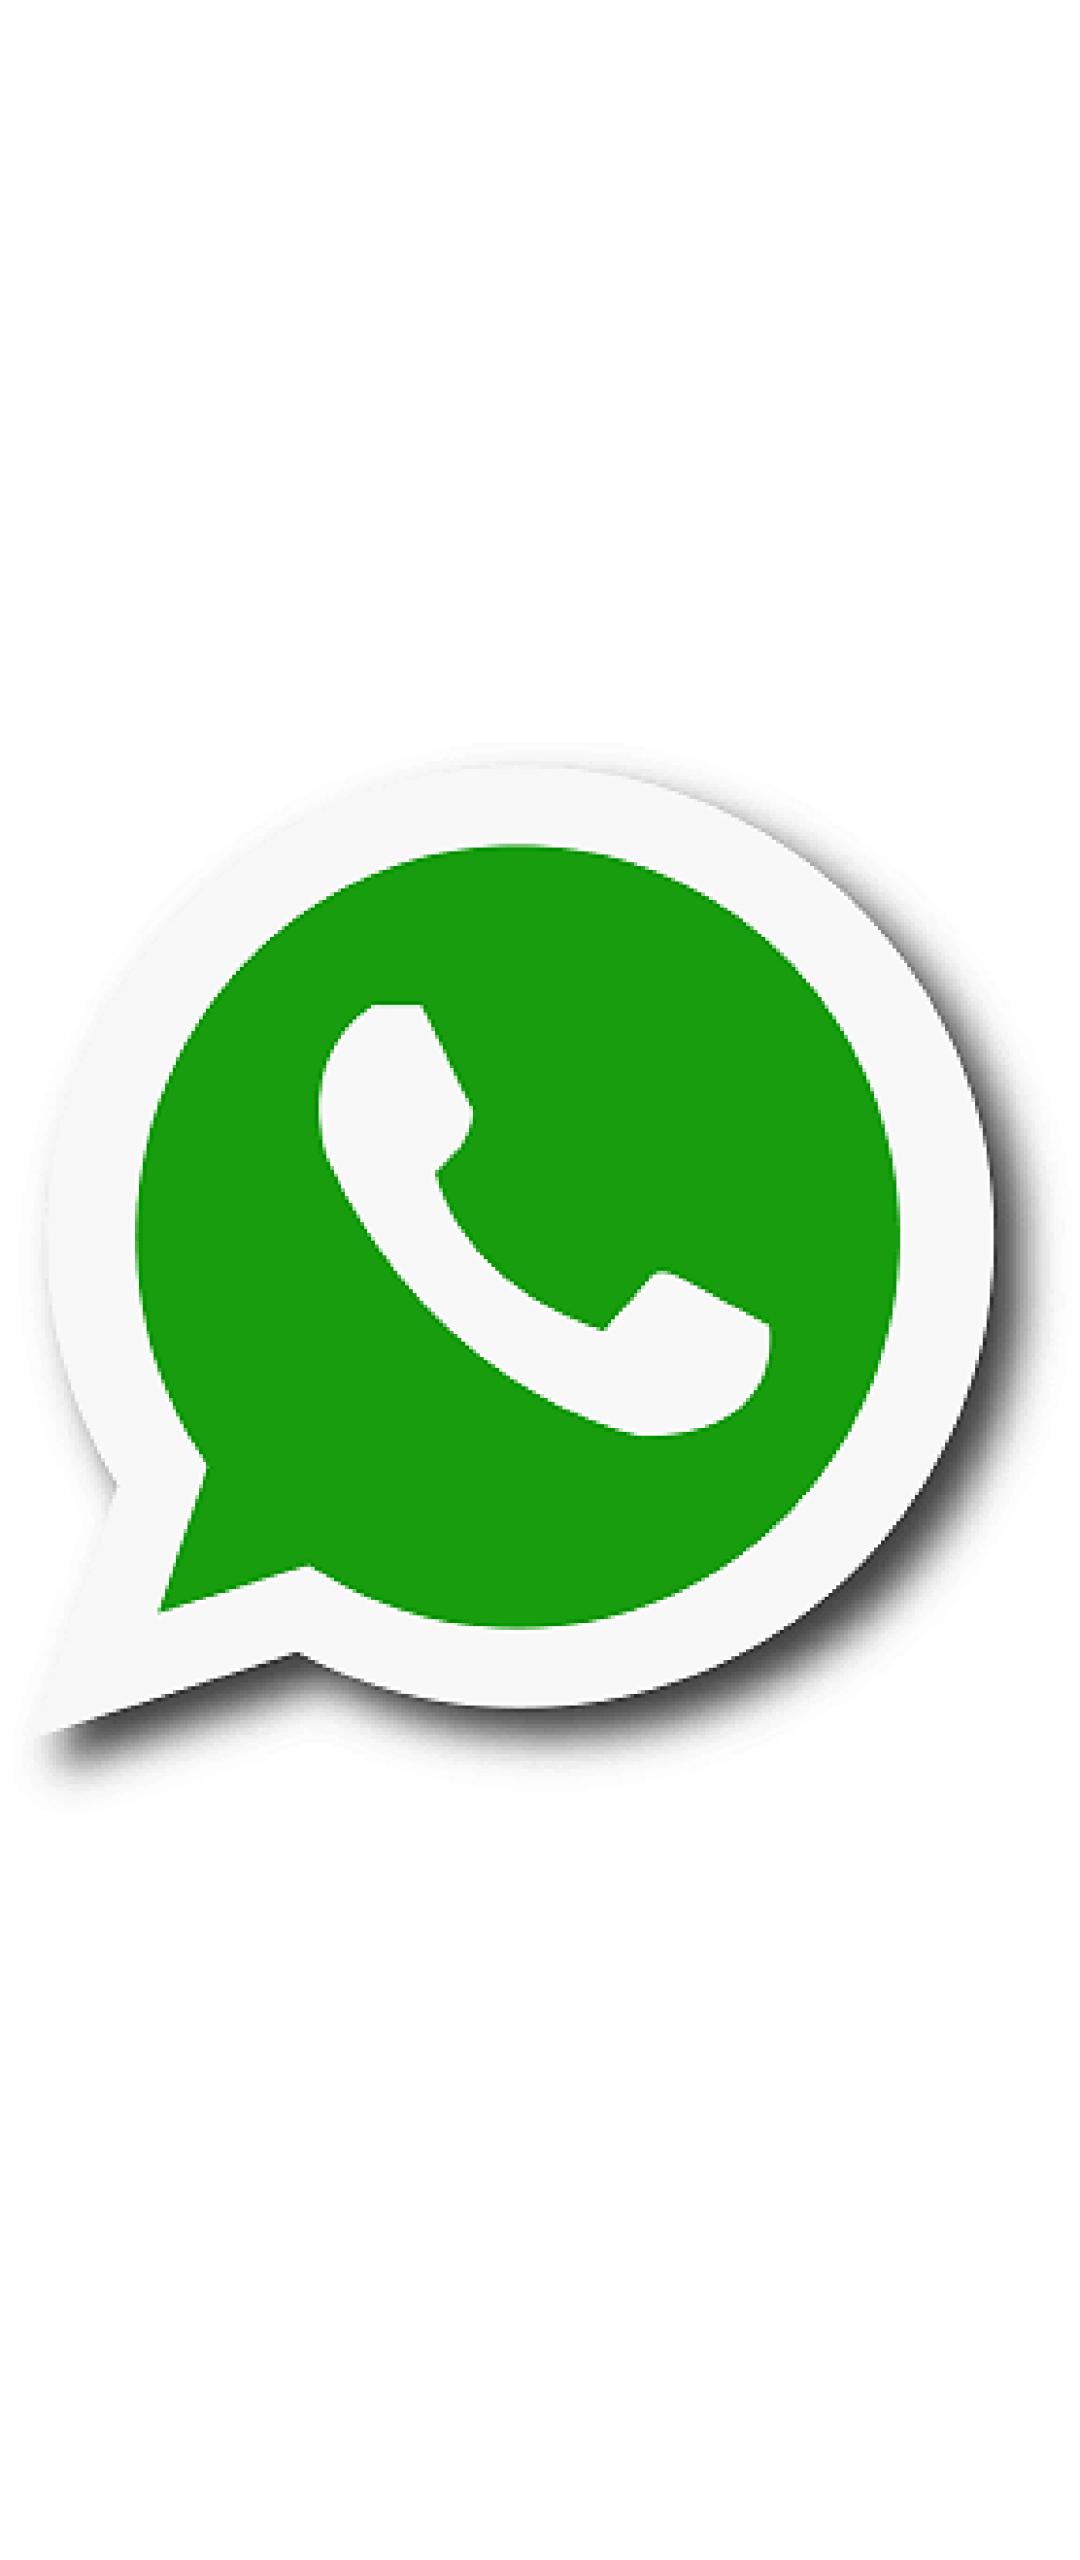 WhatsApp ya comenzó a verificar cuentas de empresas